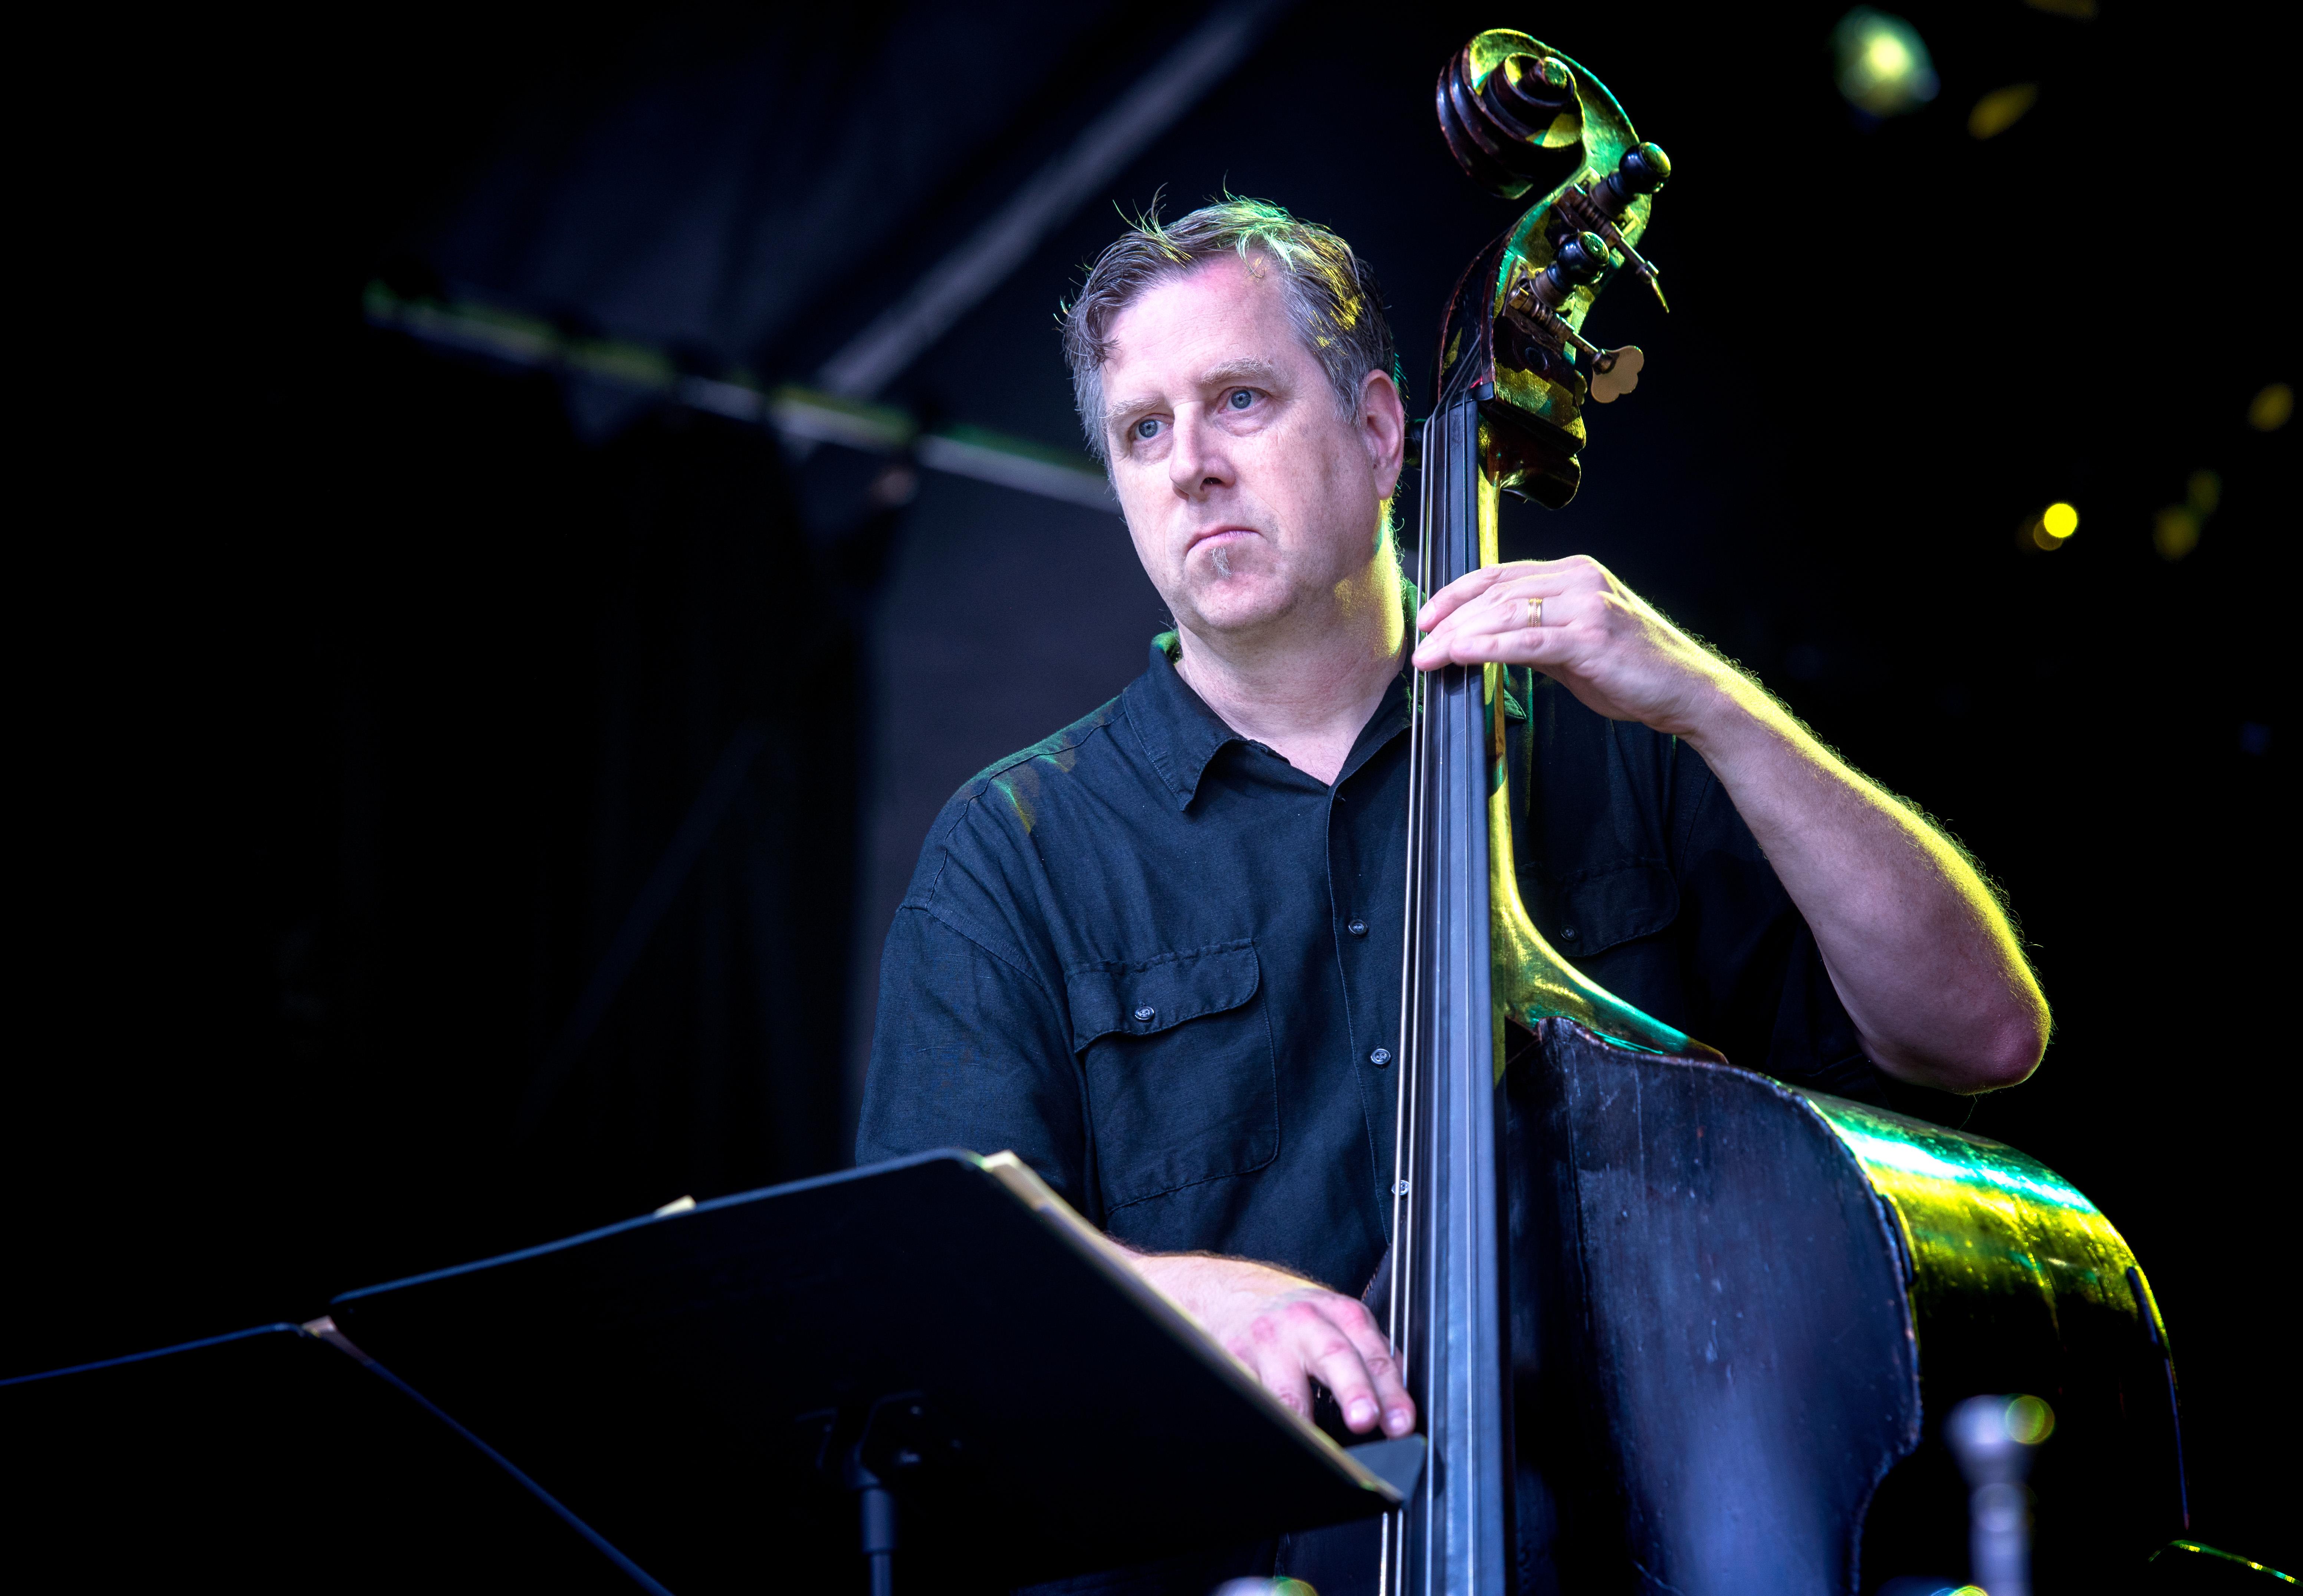 Alec Walkington With The Joe Sullivan Big Band At The Montreal International Jazz Festival 2018